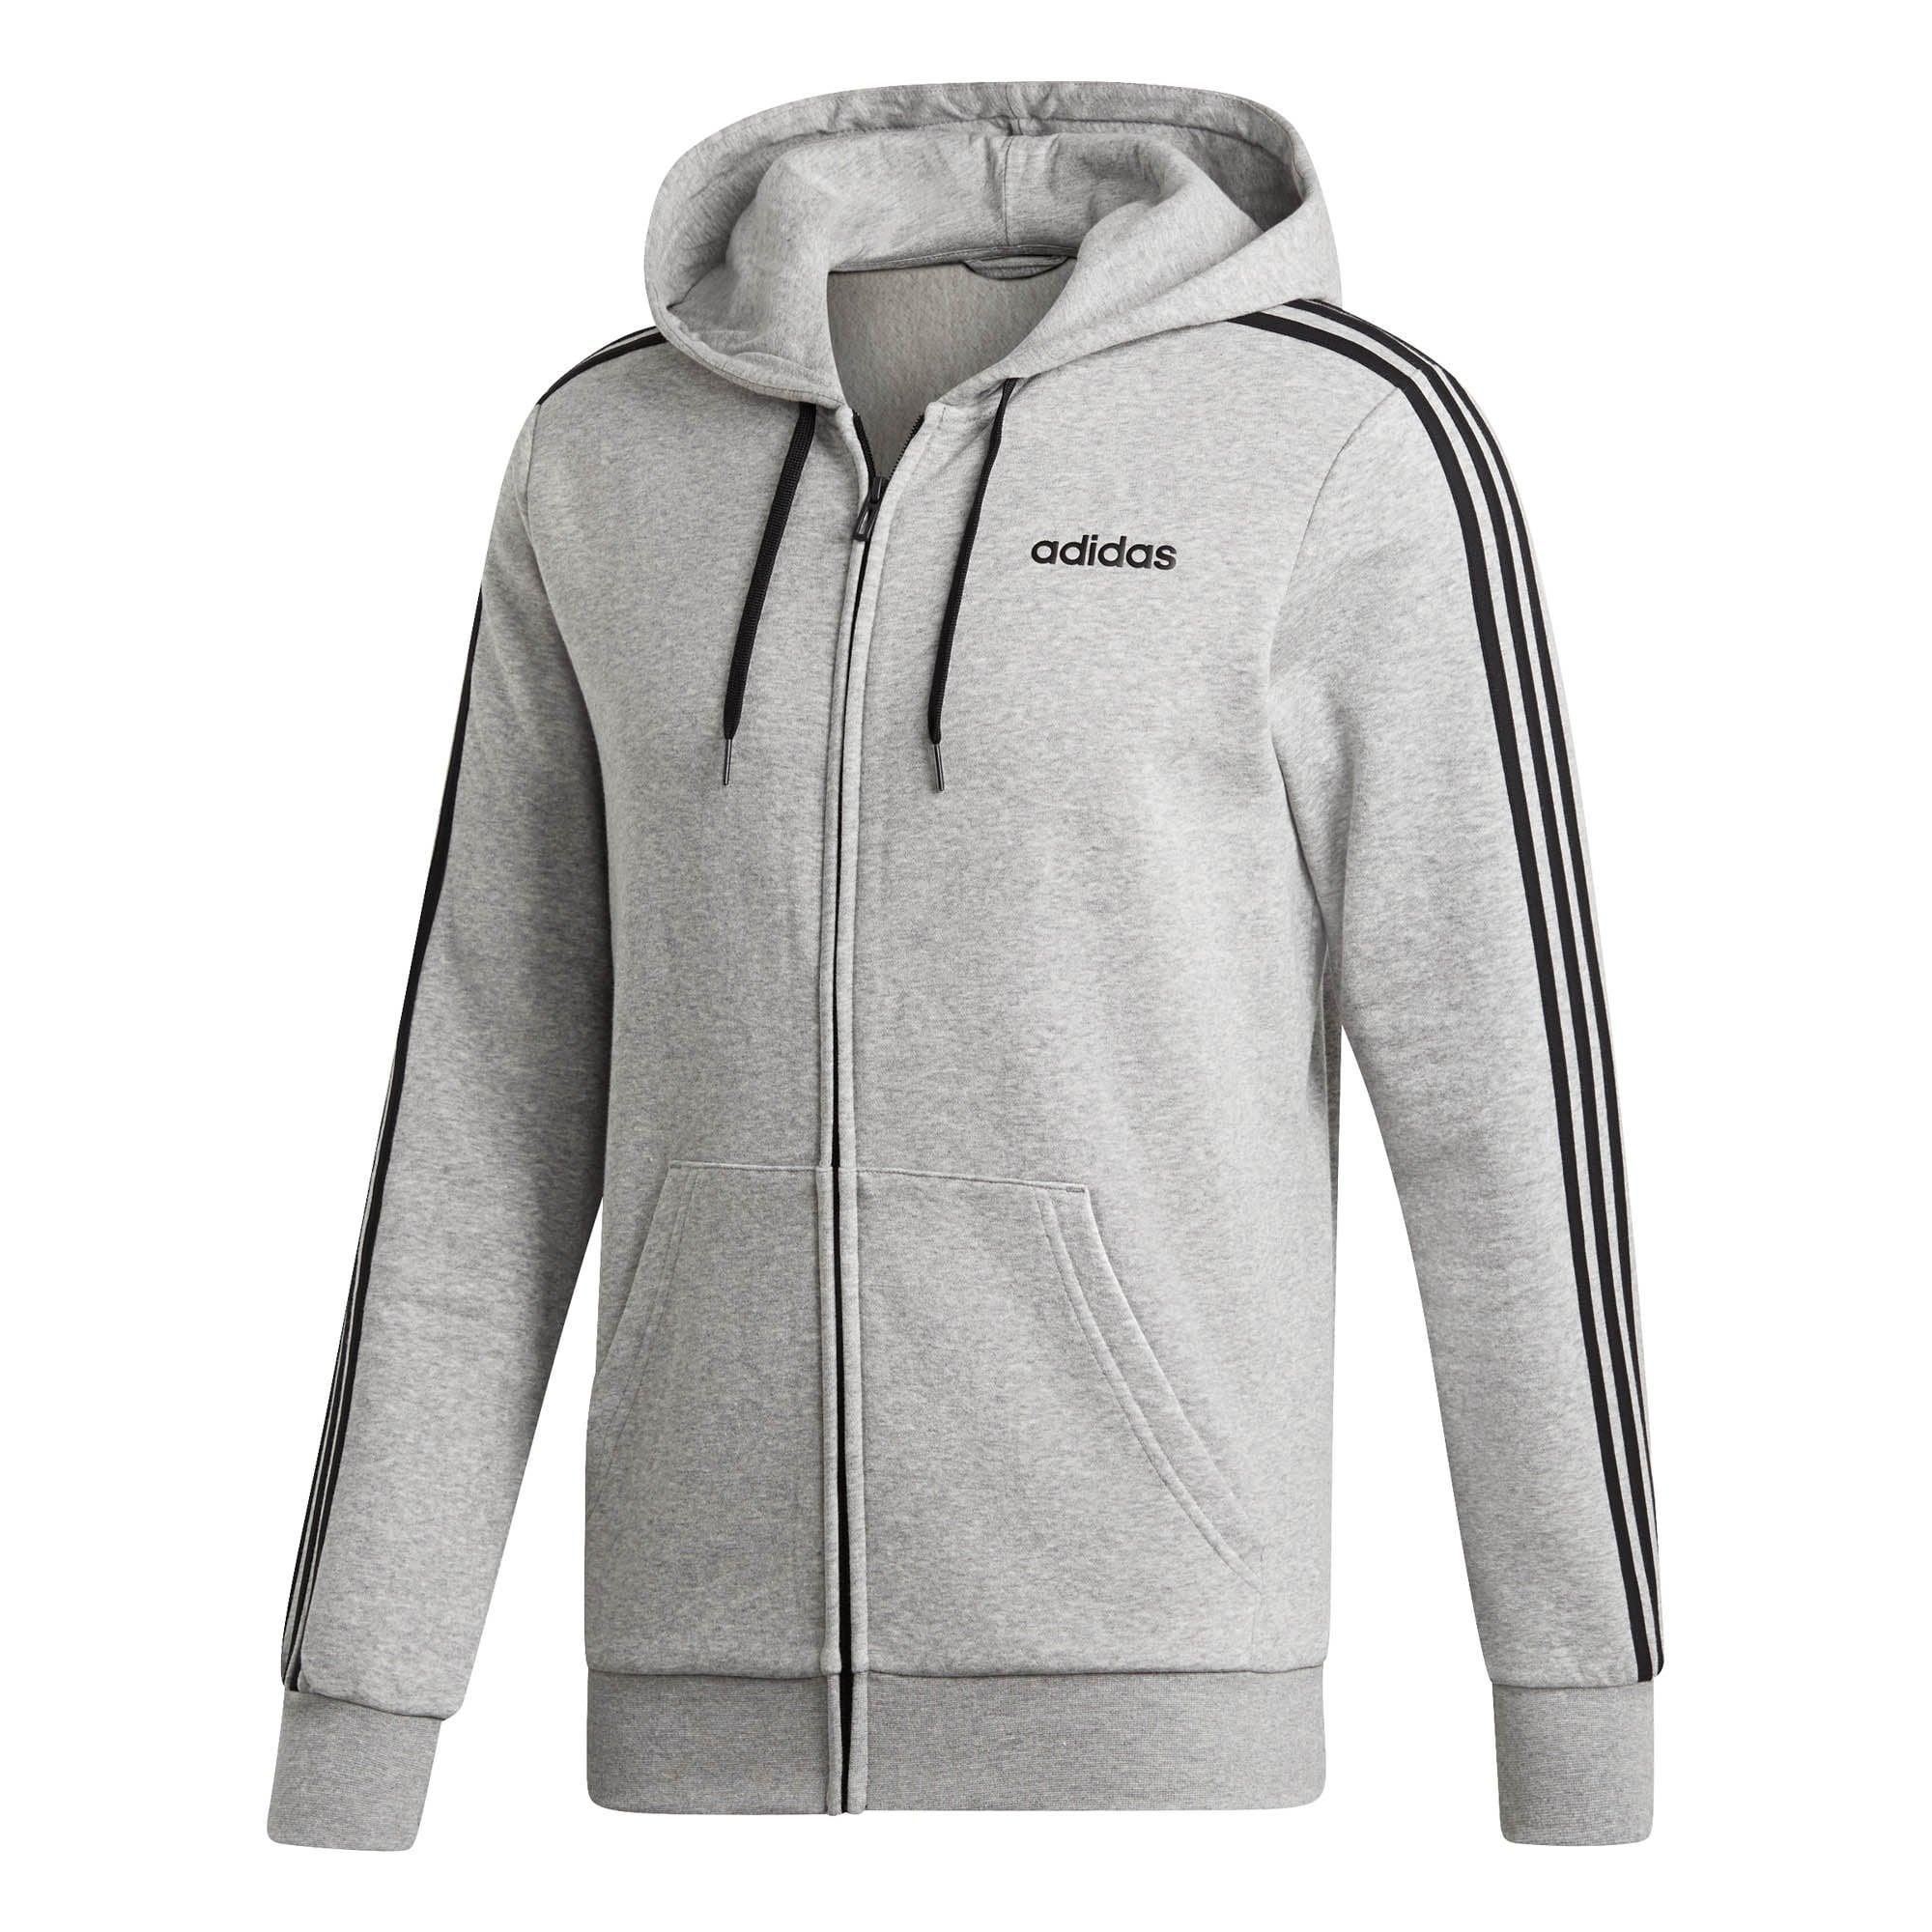 adidas Essentails 3Stripes Full Zip Hoody adidas Herren